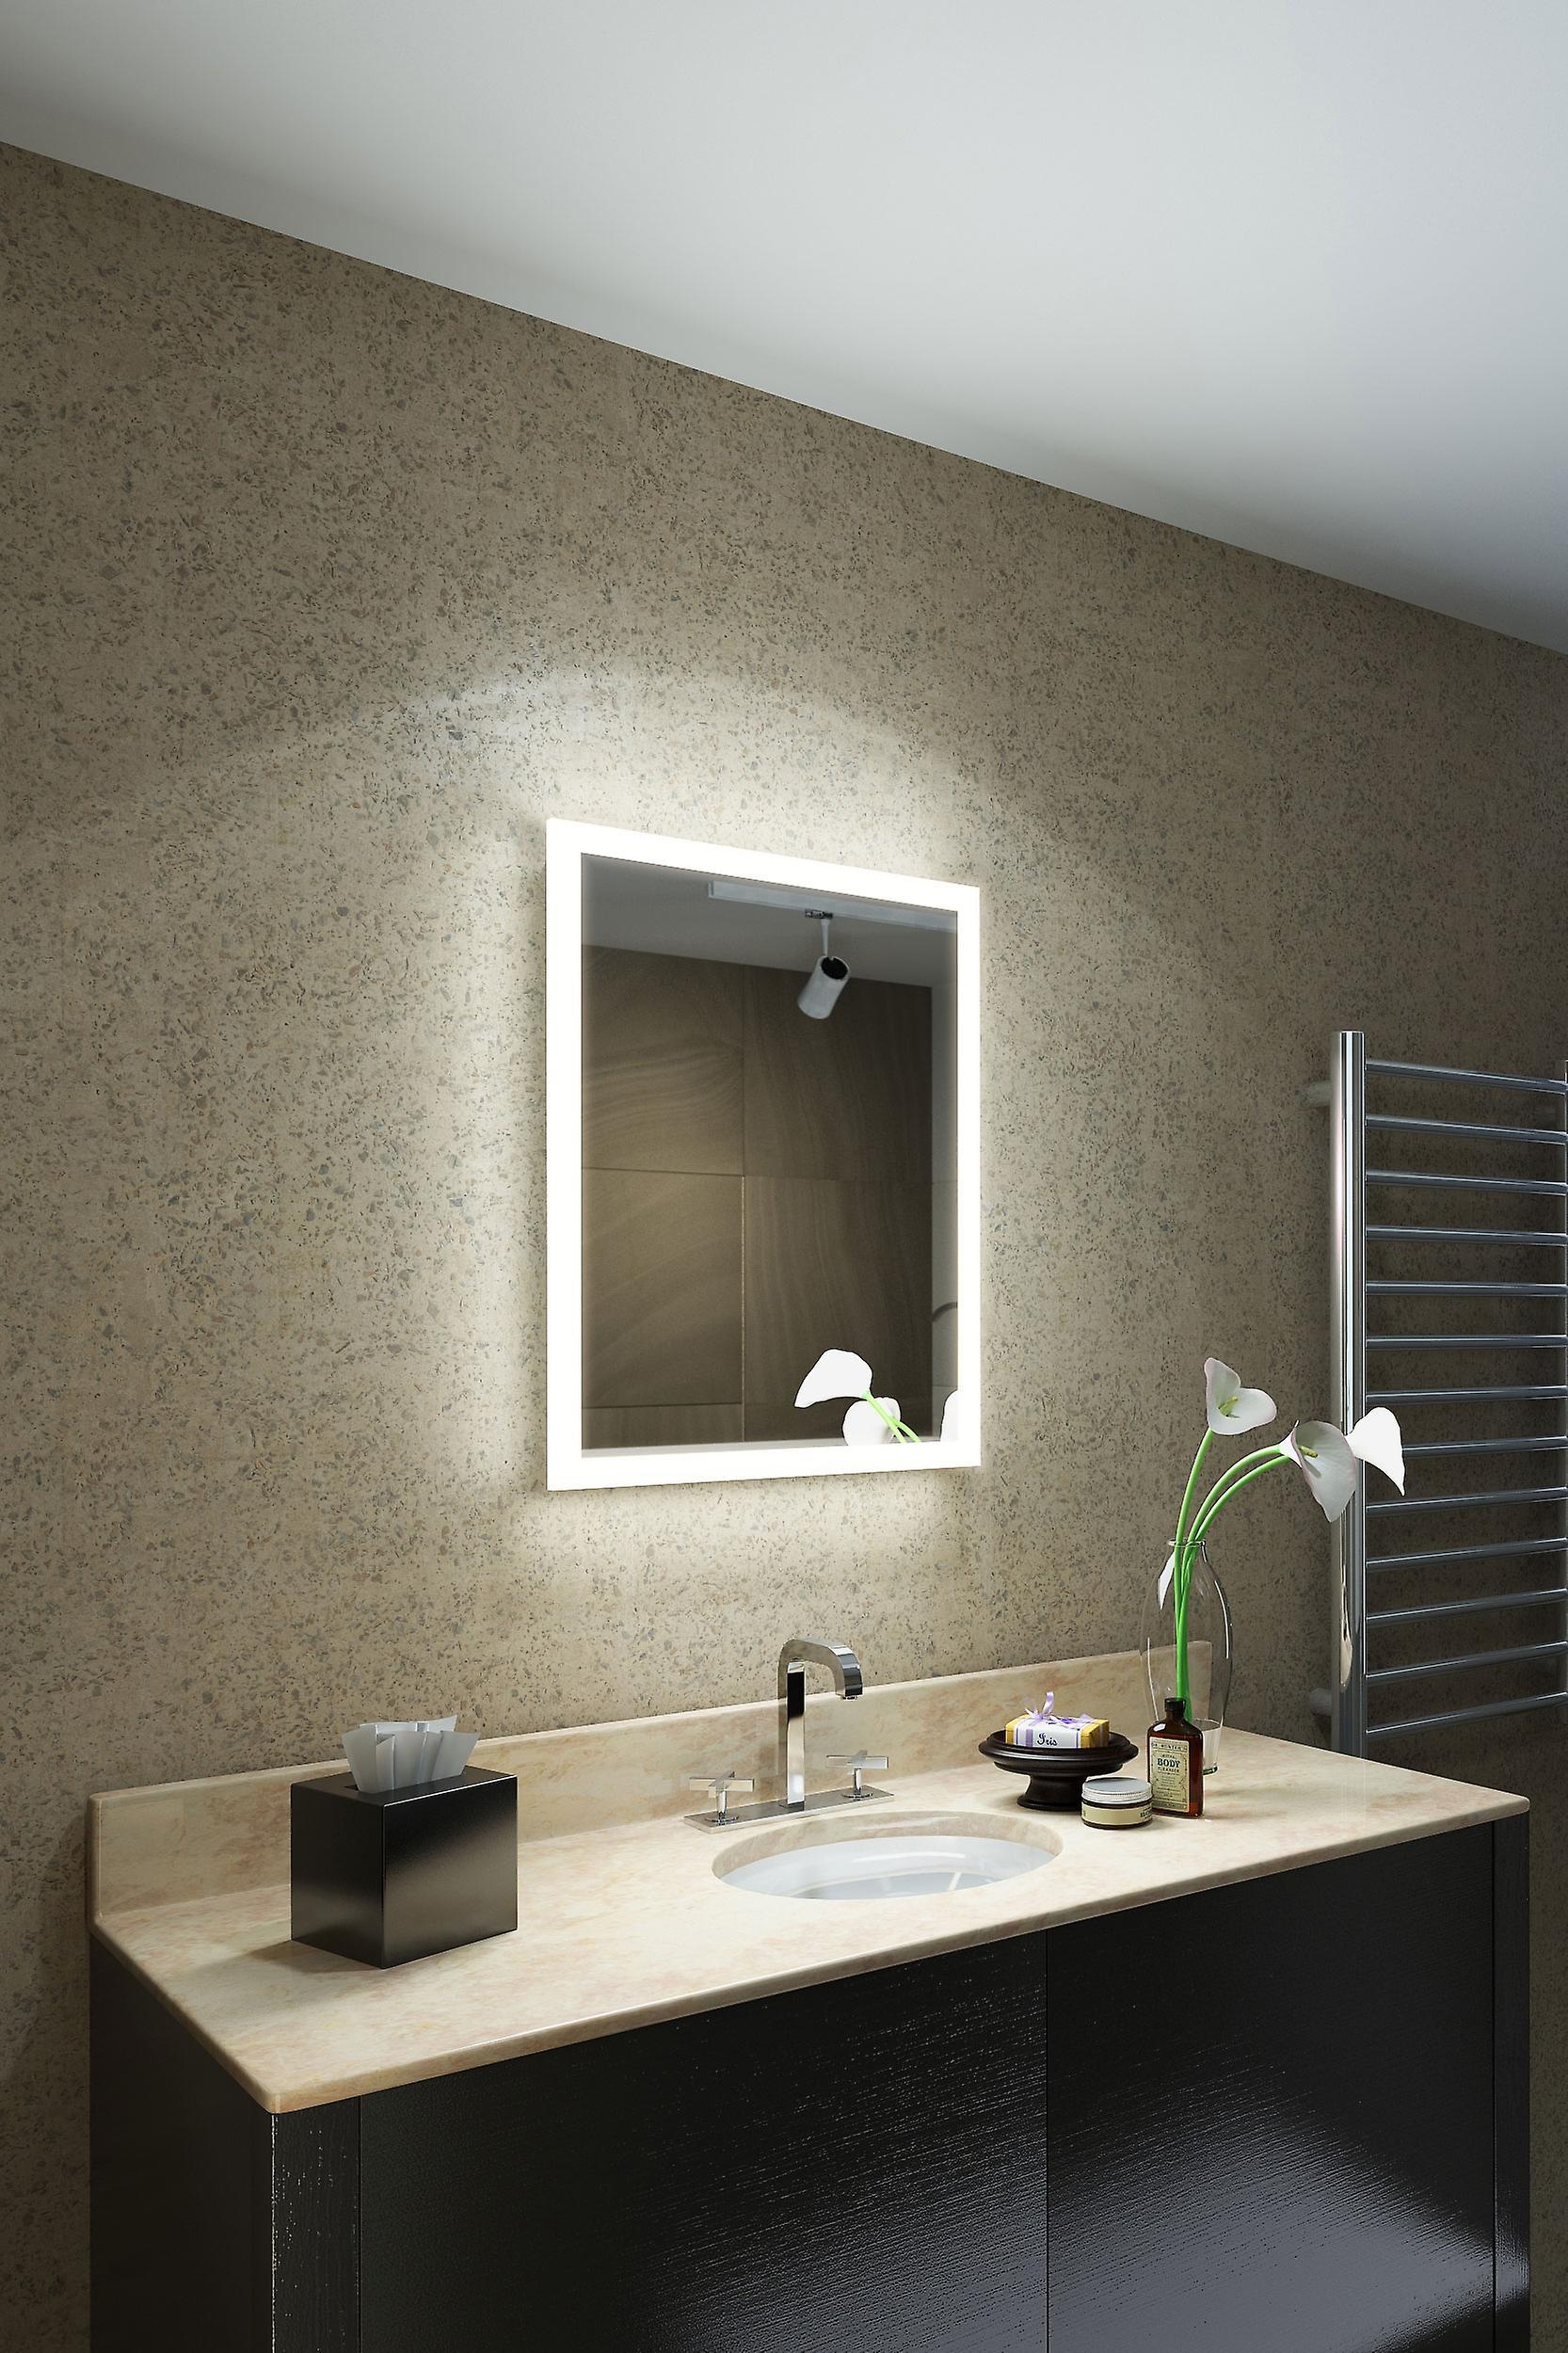 RGB Shaver LED Bathroom Mirror with Demister pad & sensor K1416irgb